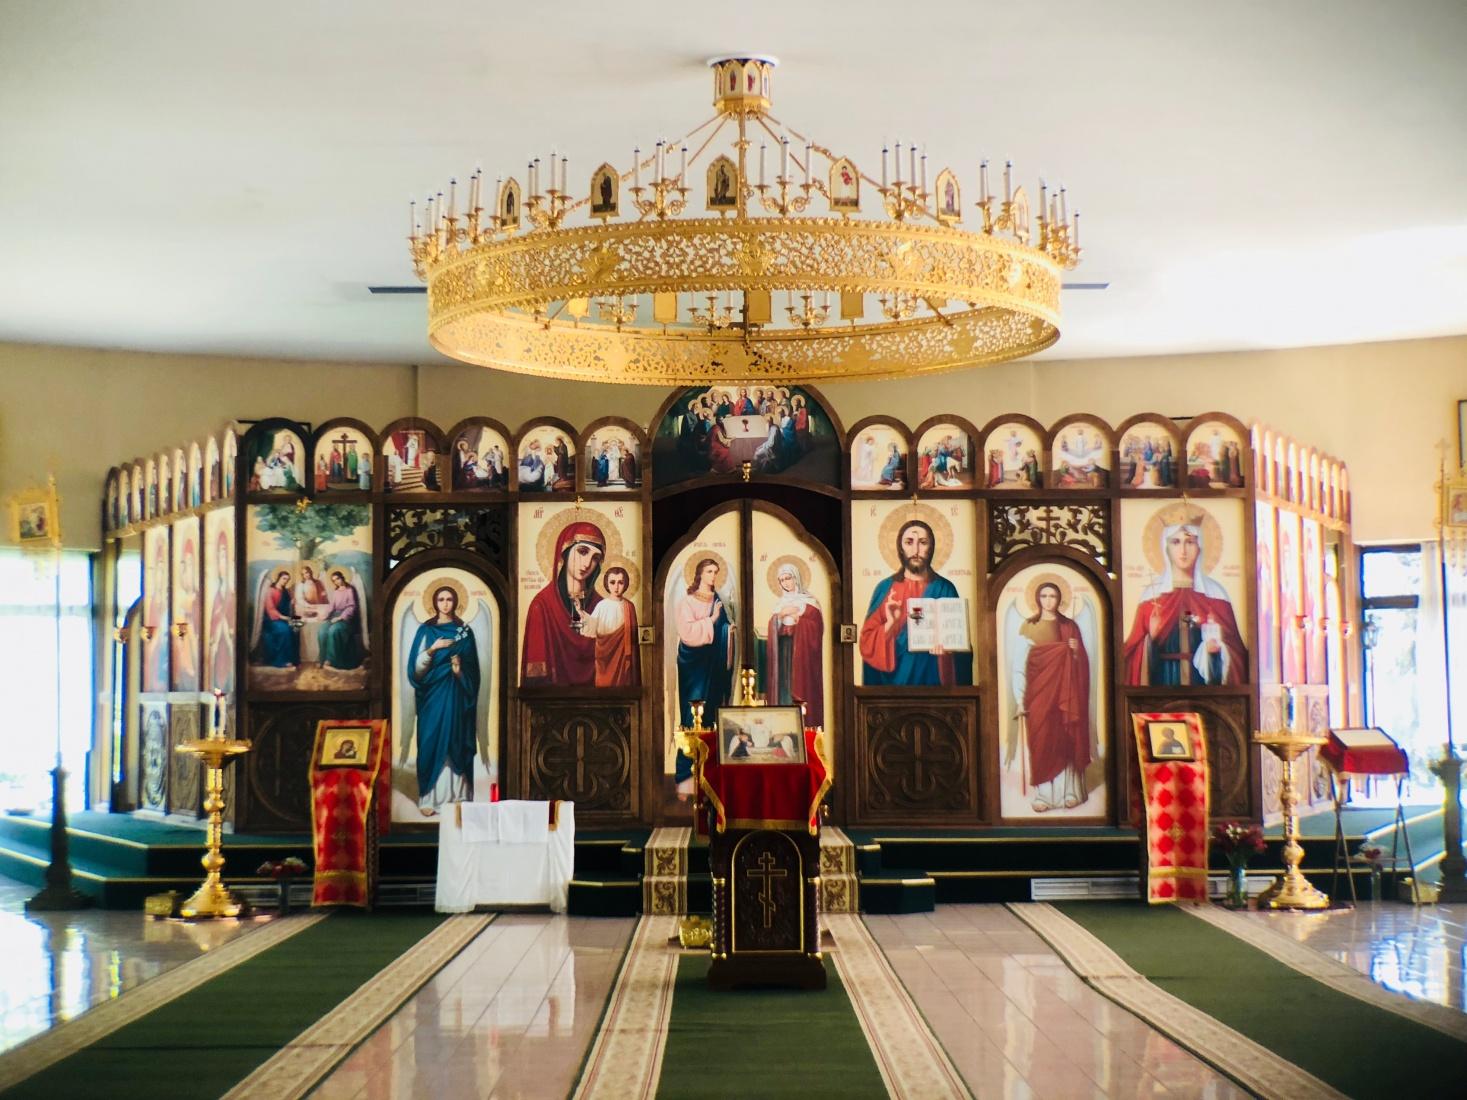 Inside Russian Orthodox Church of St Ludmila in Prague Bubeneč, near Siberia Square, Sibiřské náměstí, notable for unique circular architecture.